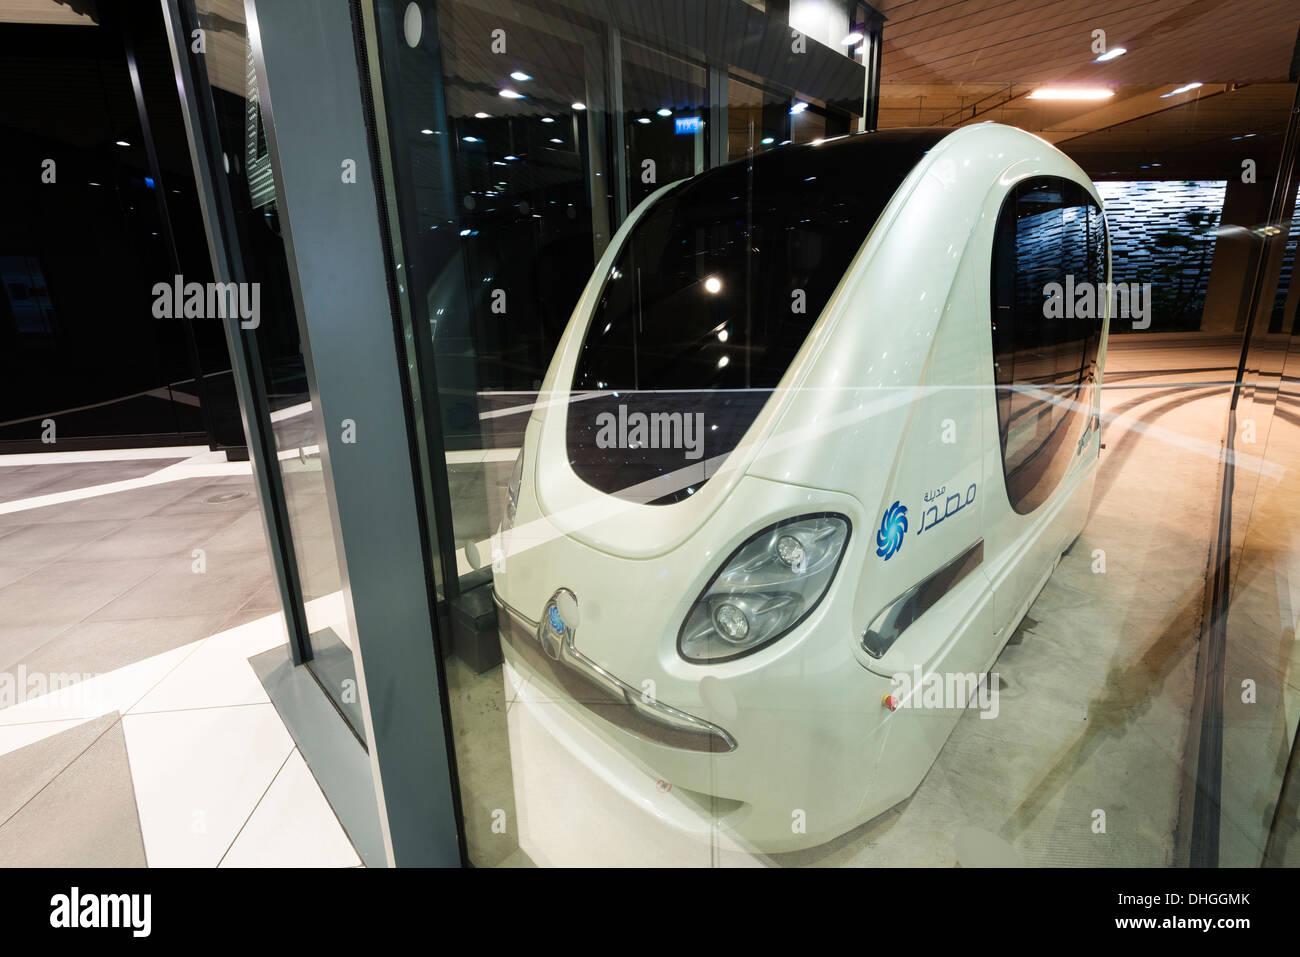 Driverless PRT Personal rapido trasporto Pod vetture a Masdar City istituto tecnico di Abu Dhabi Emirati Arabi Uniti Immagini Stock